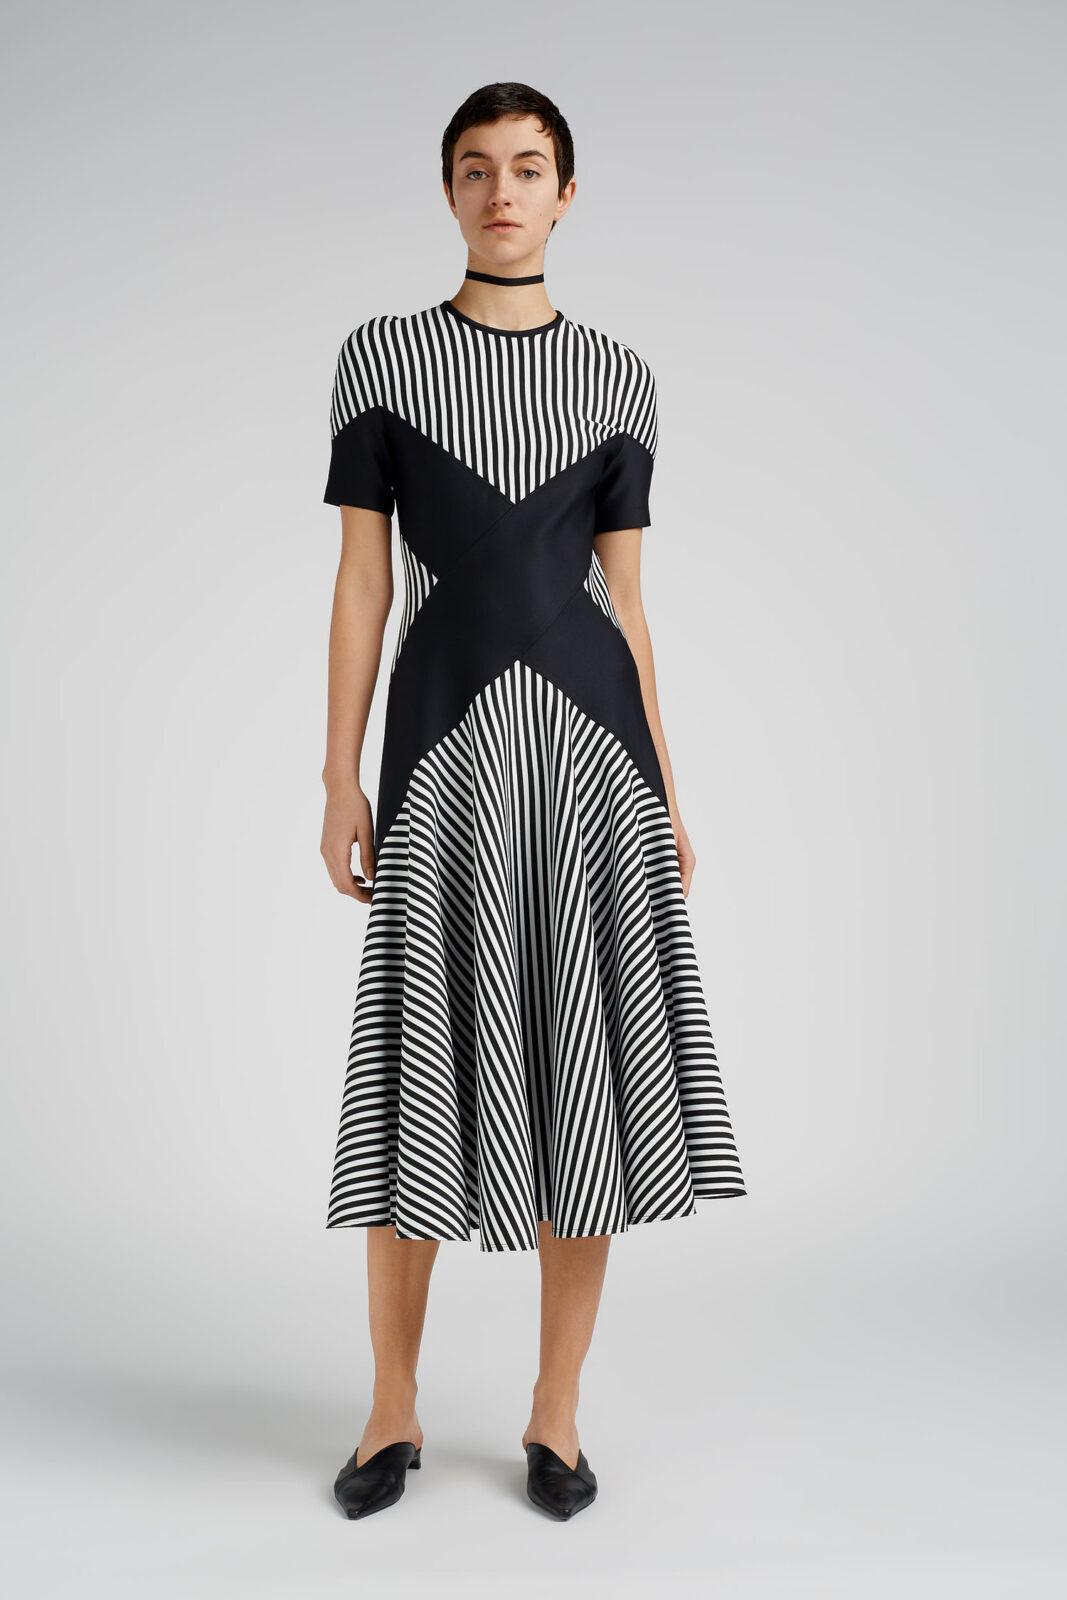 UNTTLD Sadie Dress toronto 2018